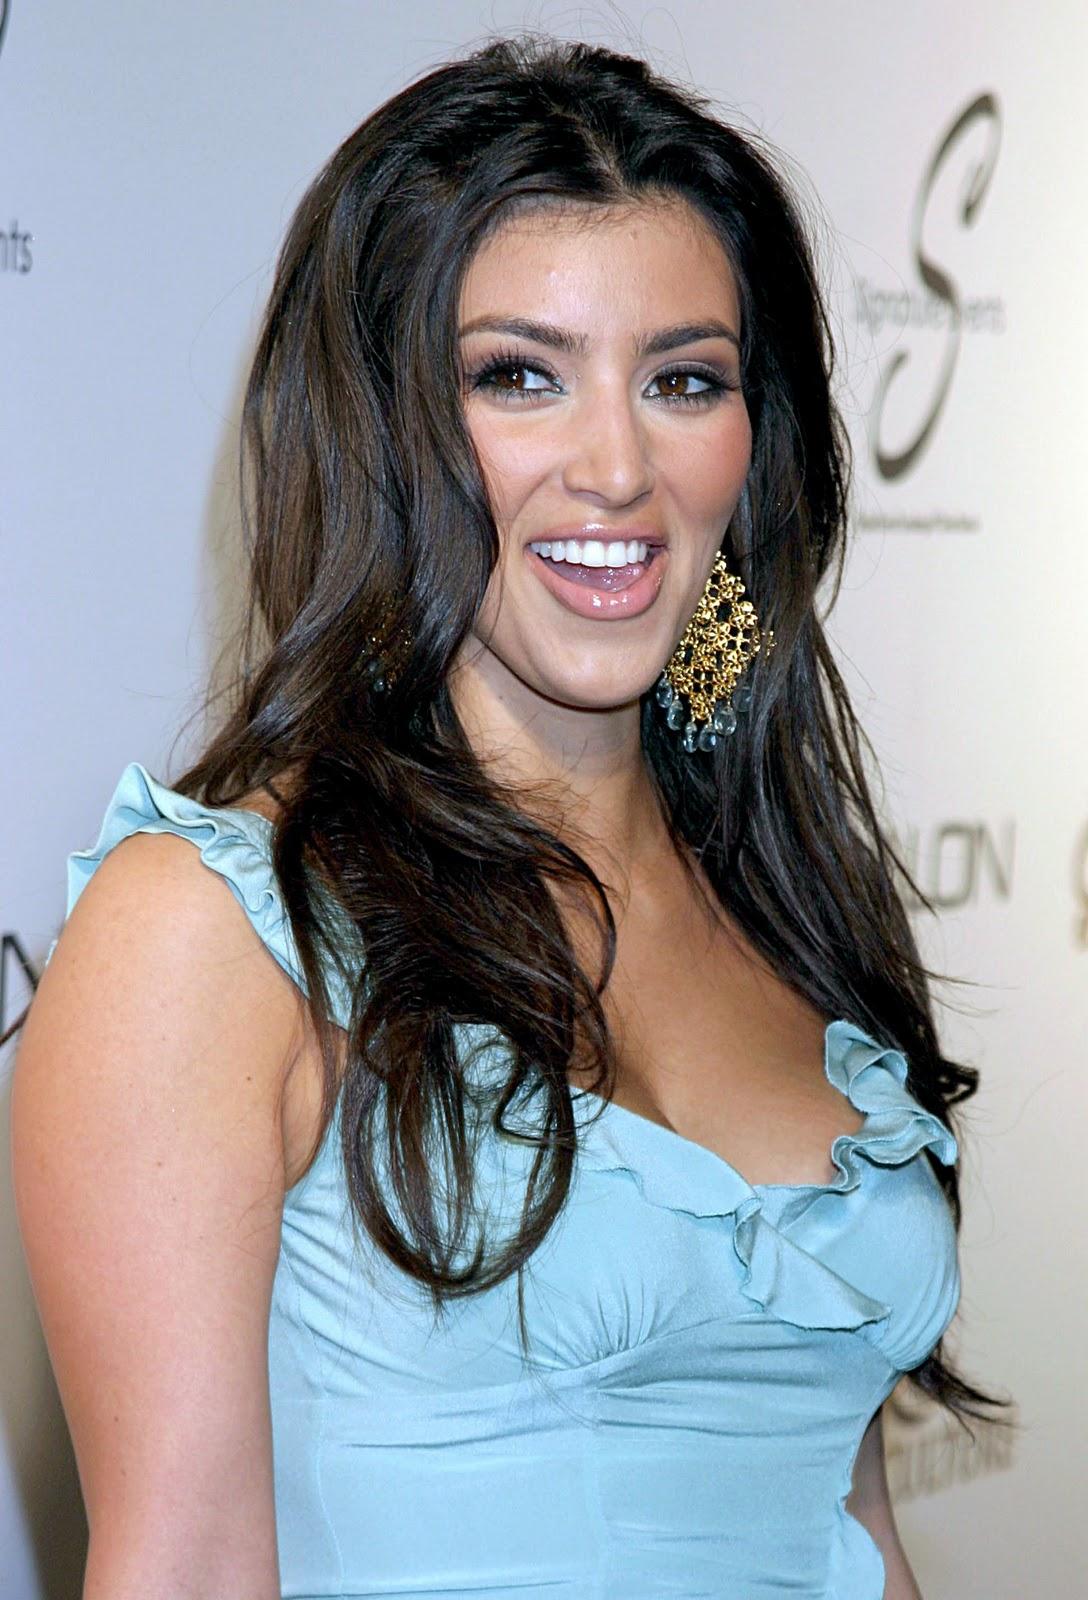 http://3.bp.blogspot.com/-S5sUlyfeD9c/TorXM5t_vPI/AAAAAAAAAeY/DmhfIWh--lc/s1600/Kim+Kardashian+smiling.jpg